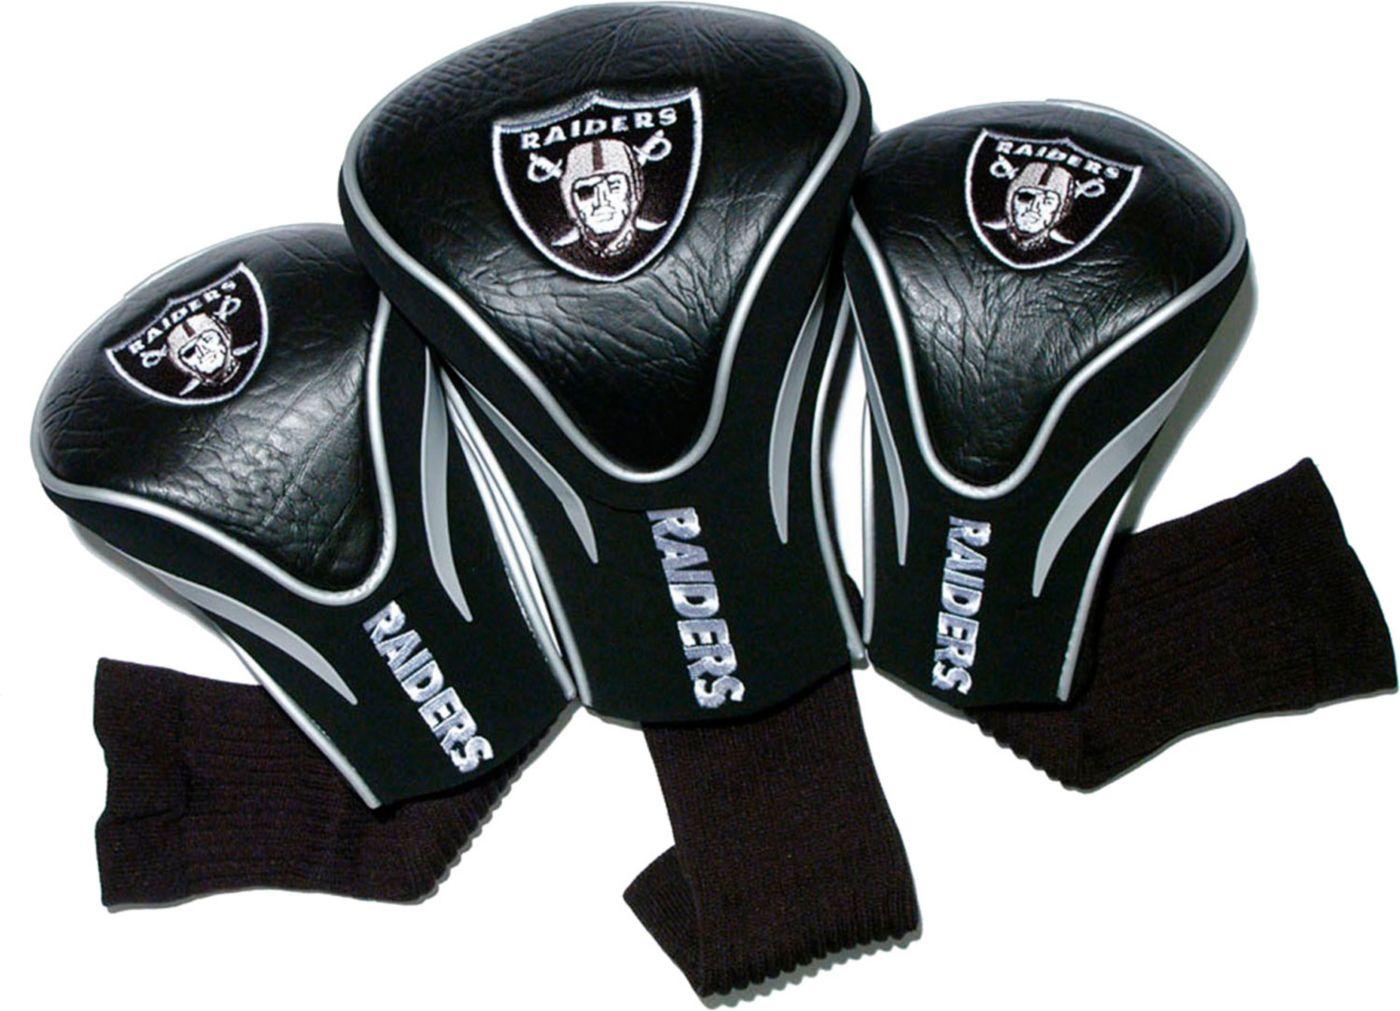 Team Golf Oakland Raiders Contour Sock Headcovers - 3 Pack